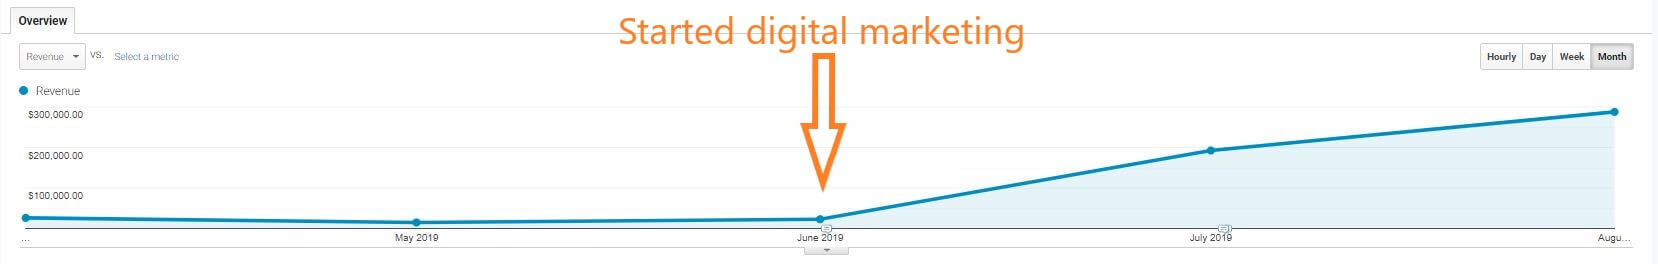 started digital marketing results